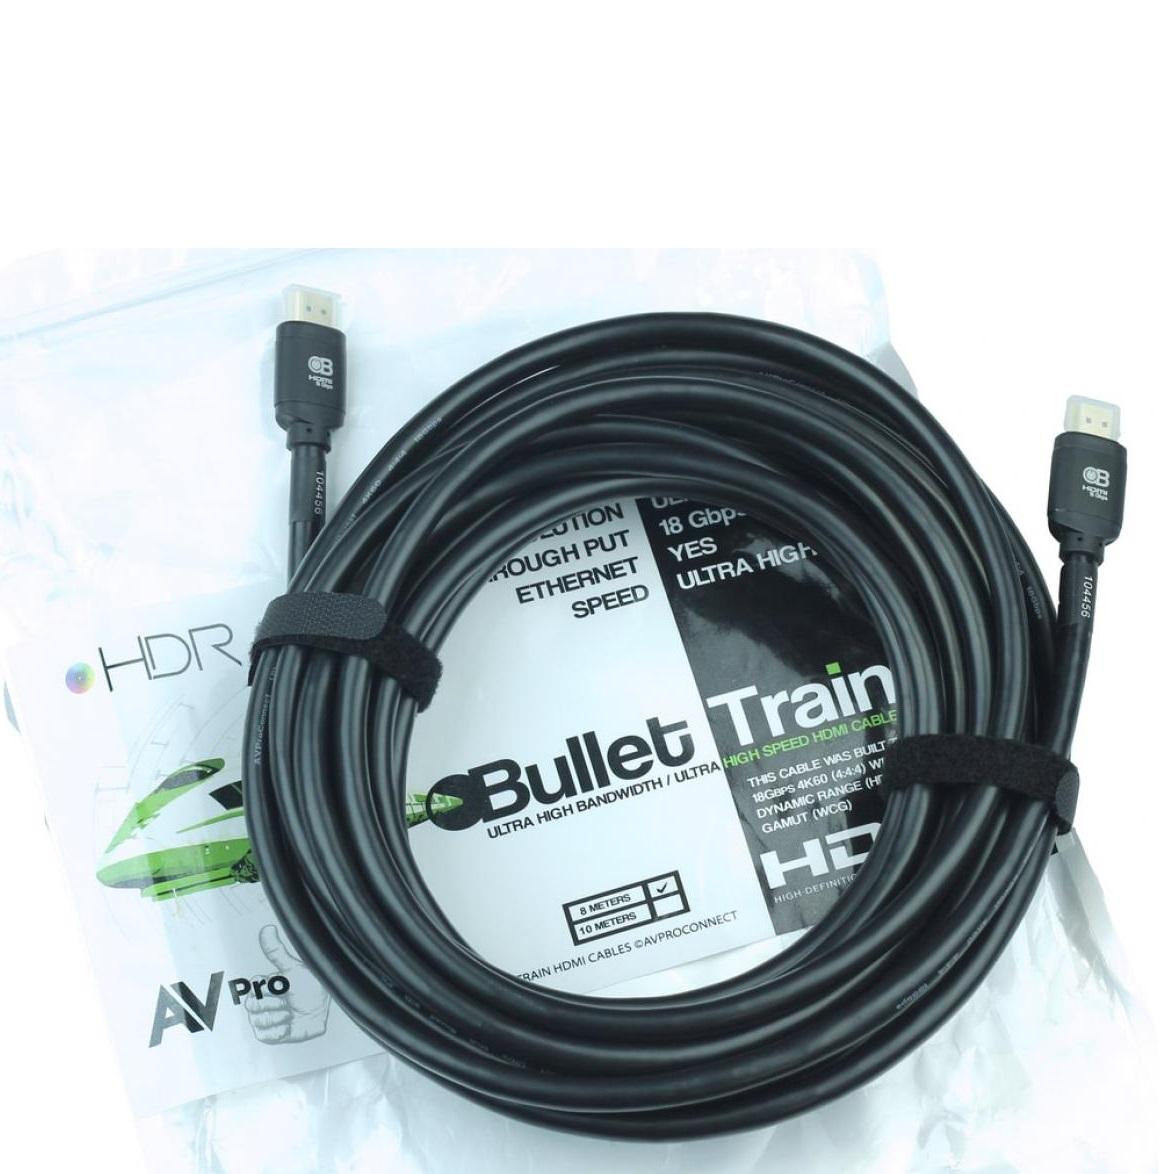 HDMI Ultra High Speed кабель AV Pro Edge AC-BT04-AUHD